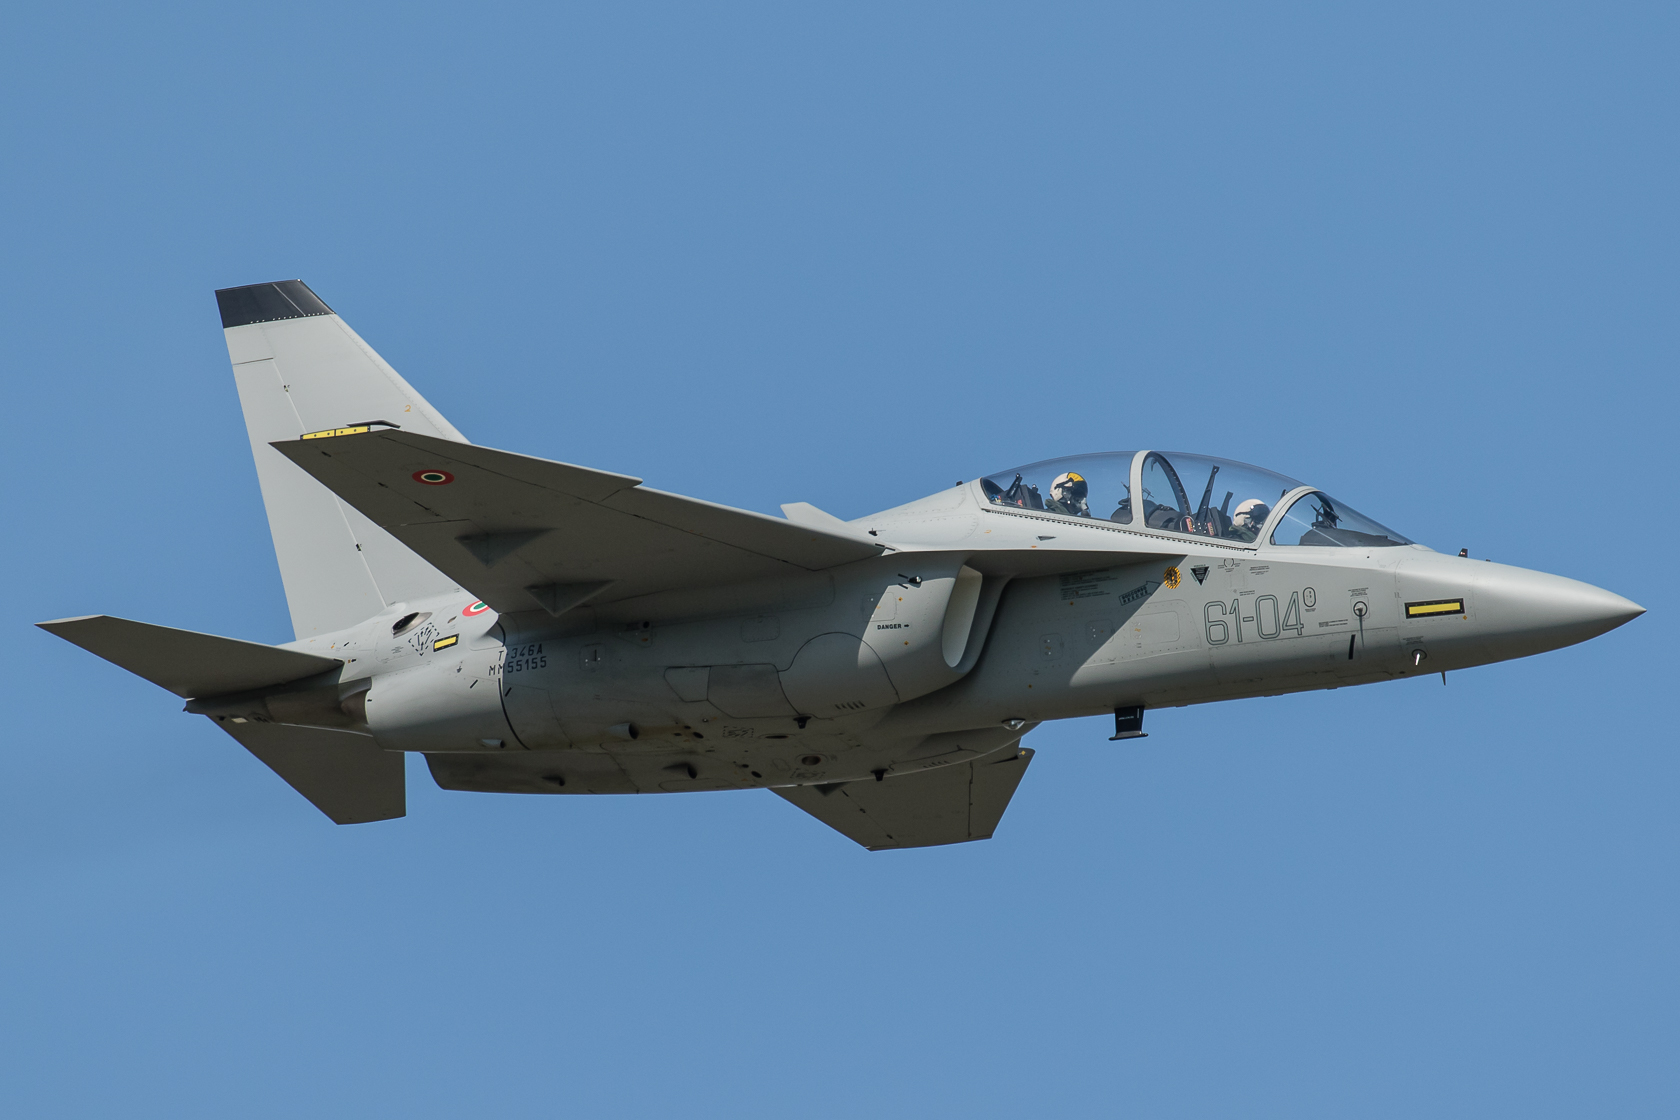 I flew the White Rocket: My T-38 Experience \u2014 Avgeekery.com - News ...